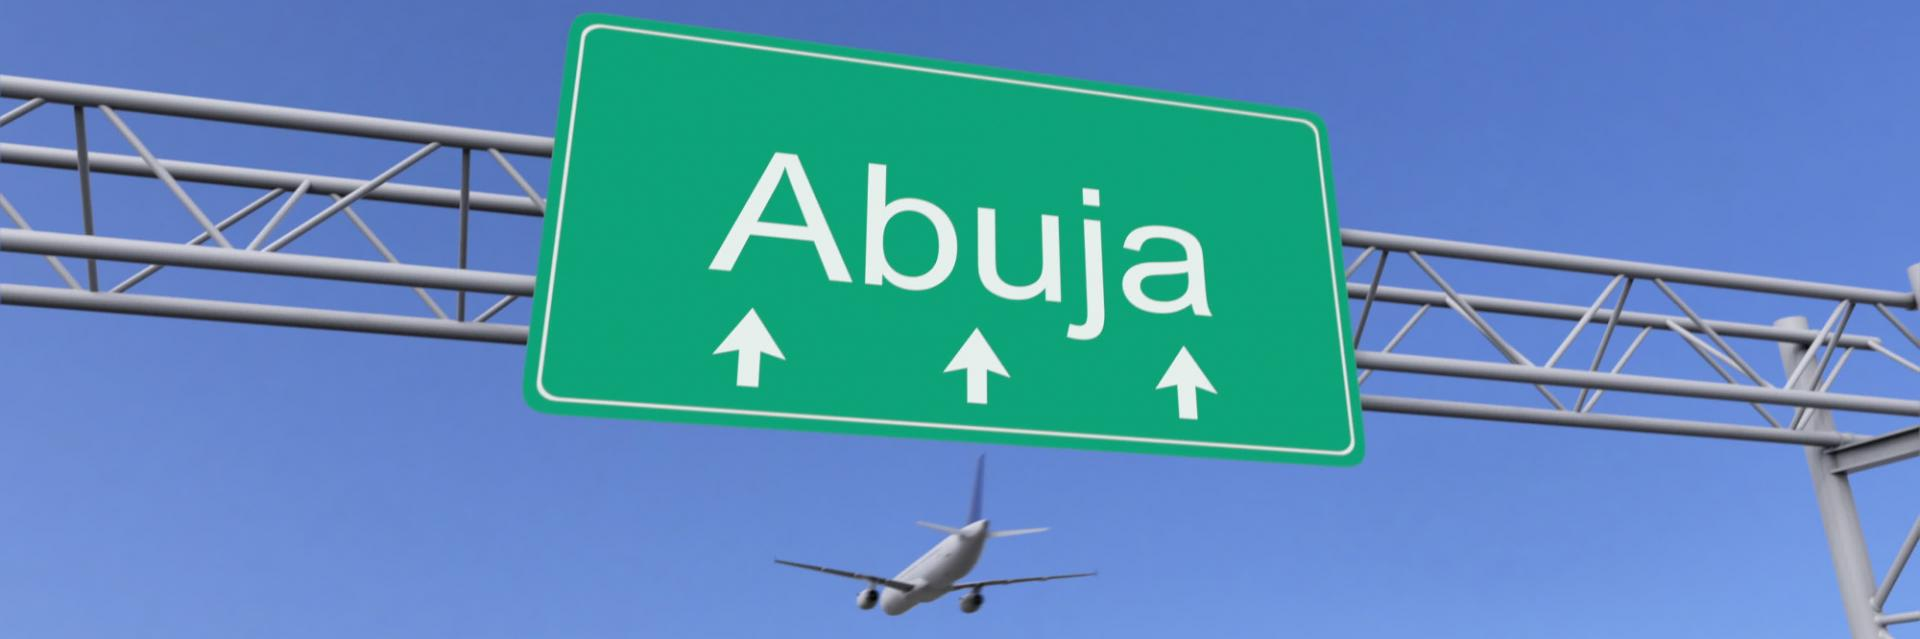 ECA's sensitization workshop on opportunities in AfCFTA for women in business ends in Abuja